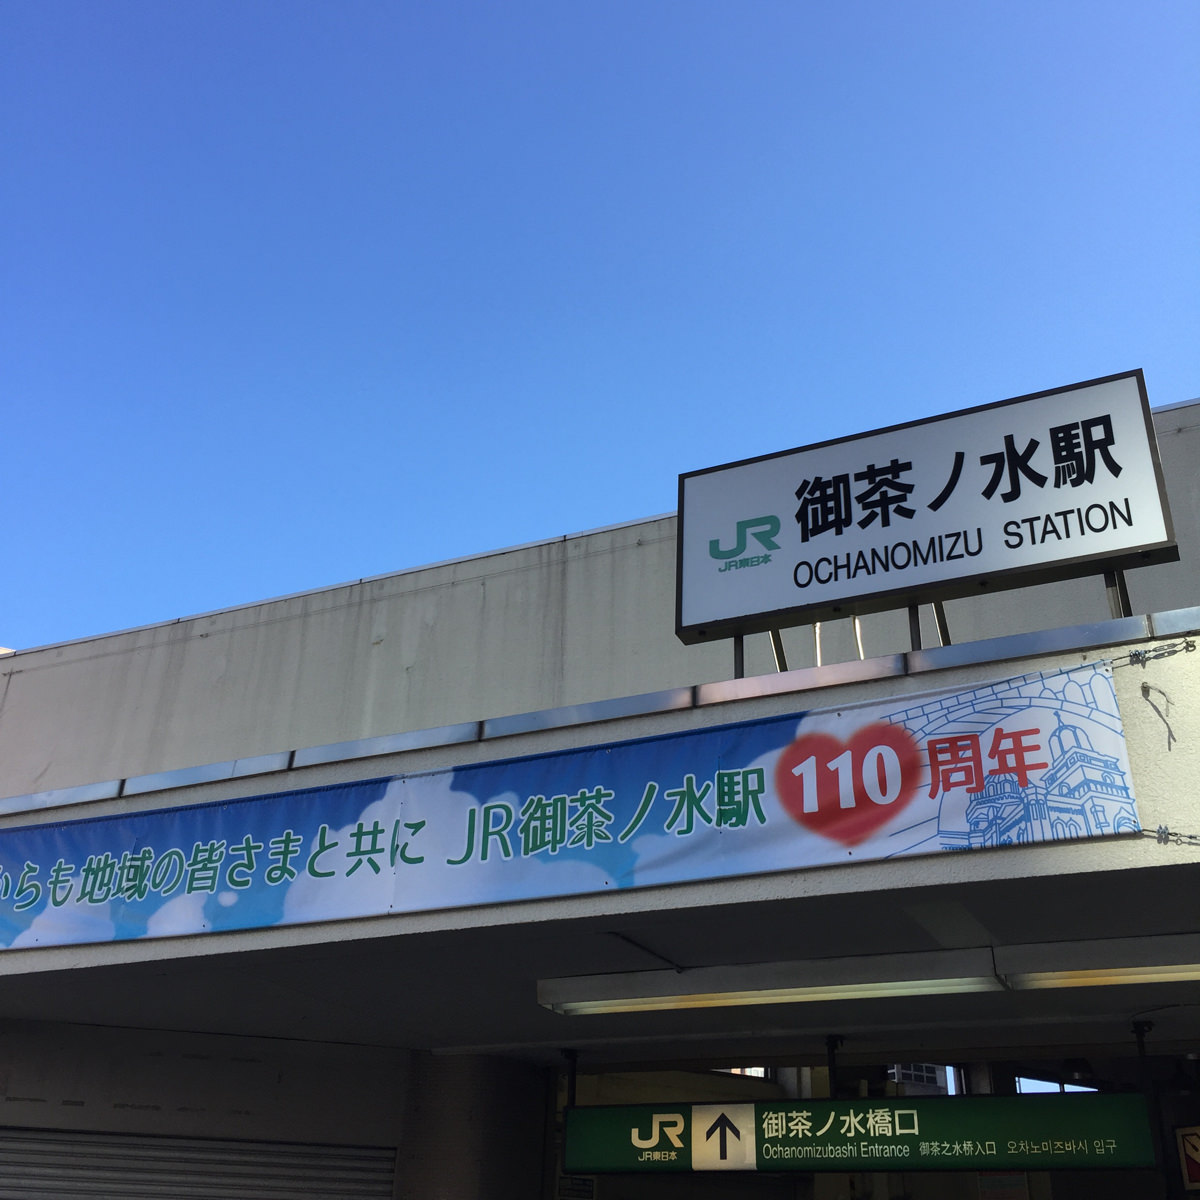 JR東日本 御茶ノ水駅